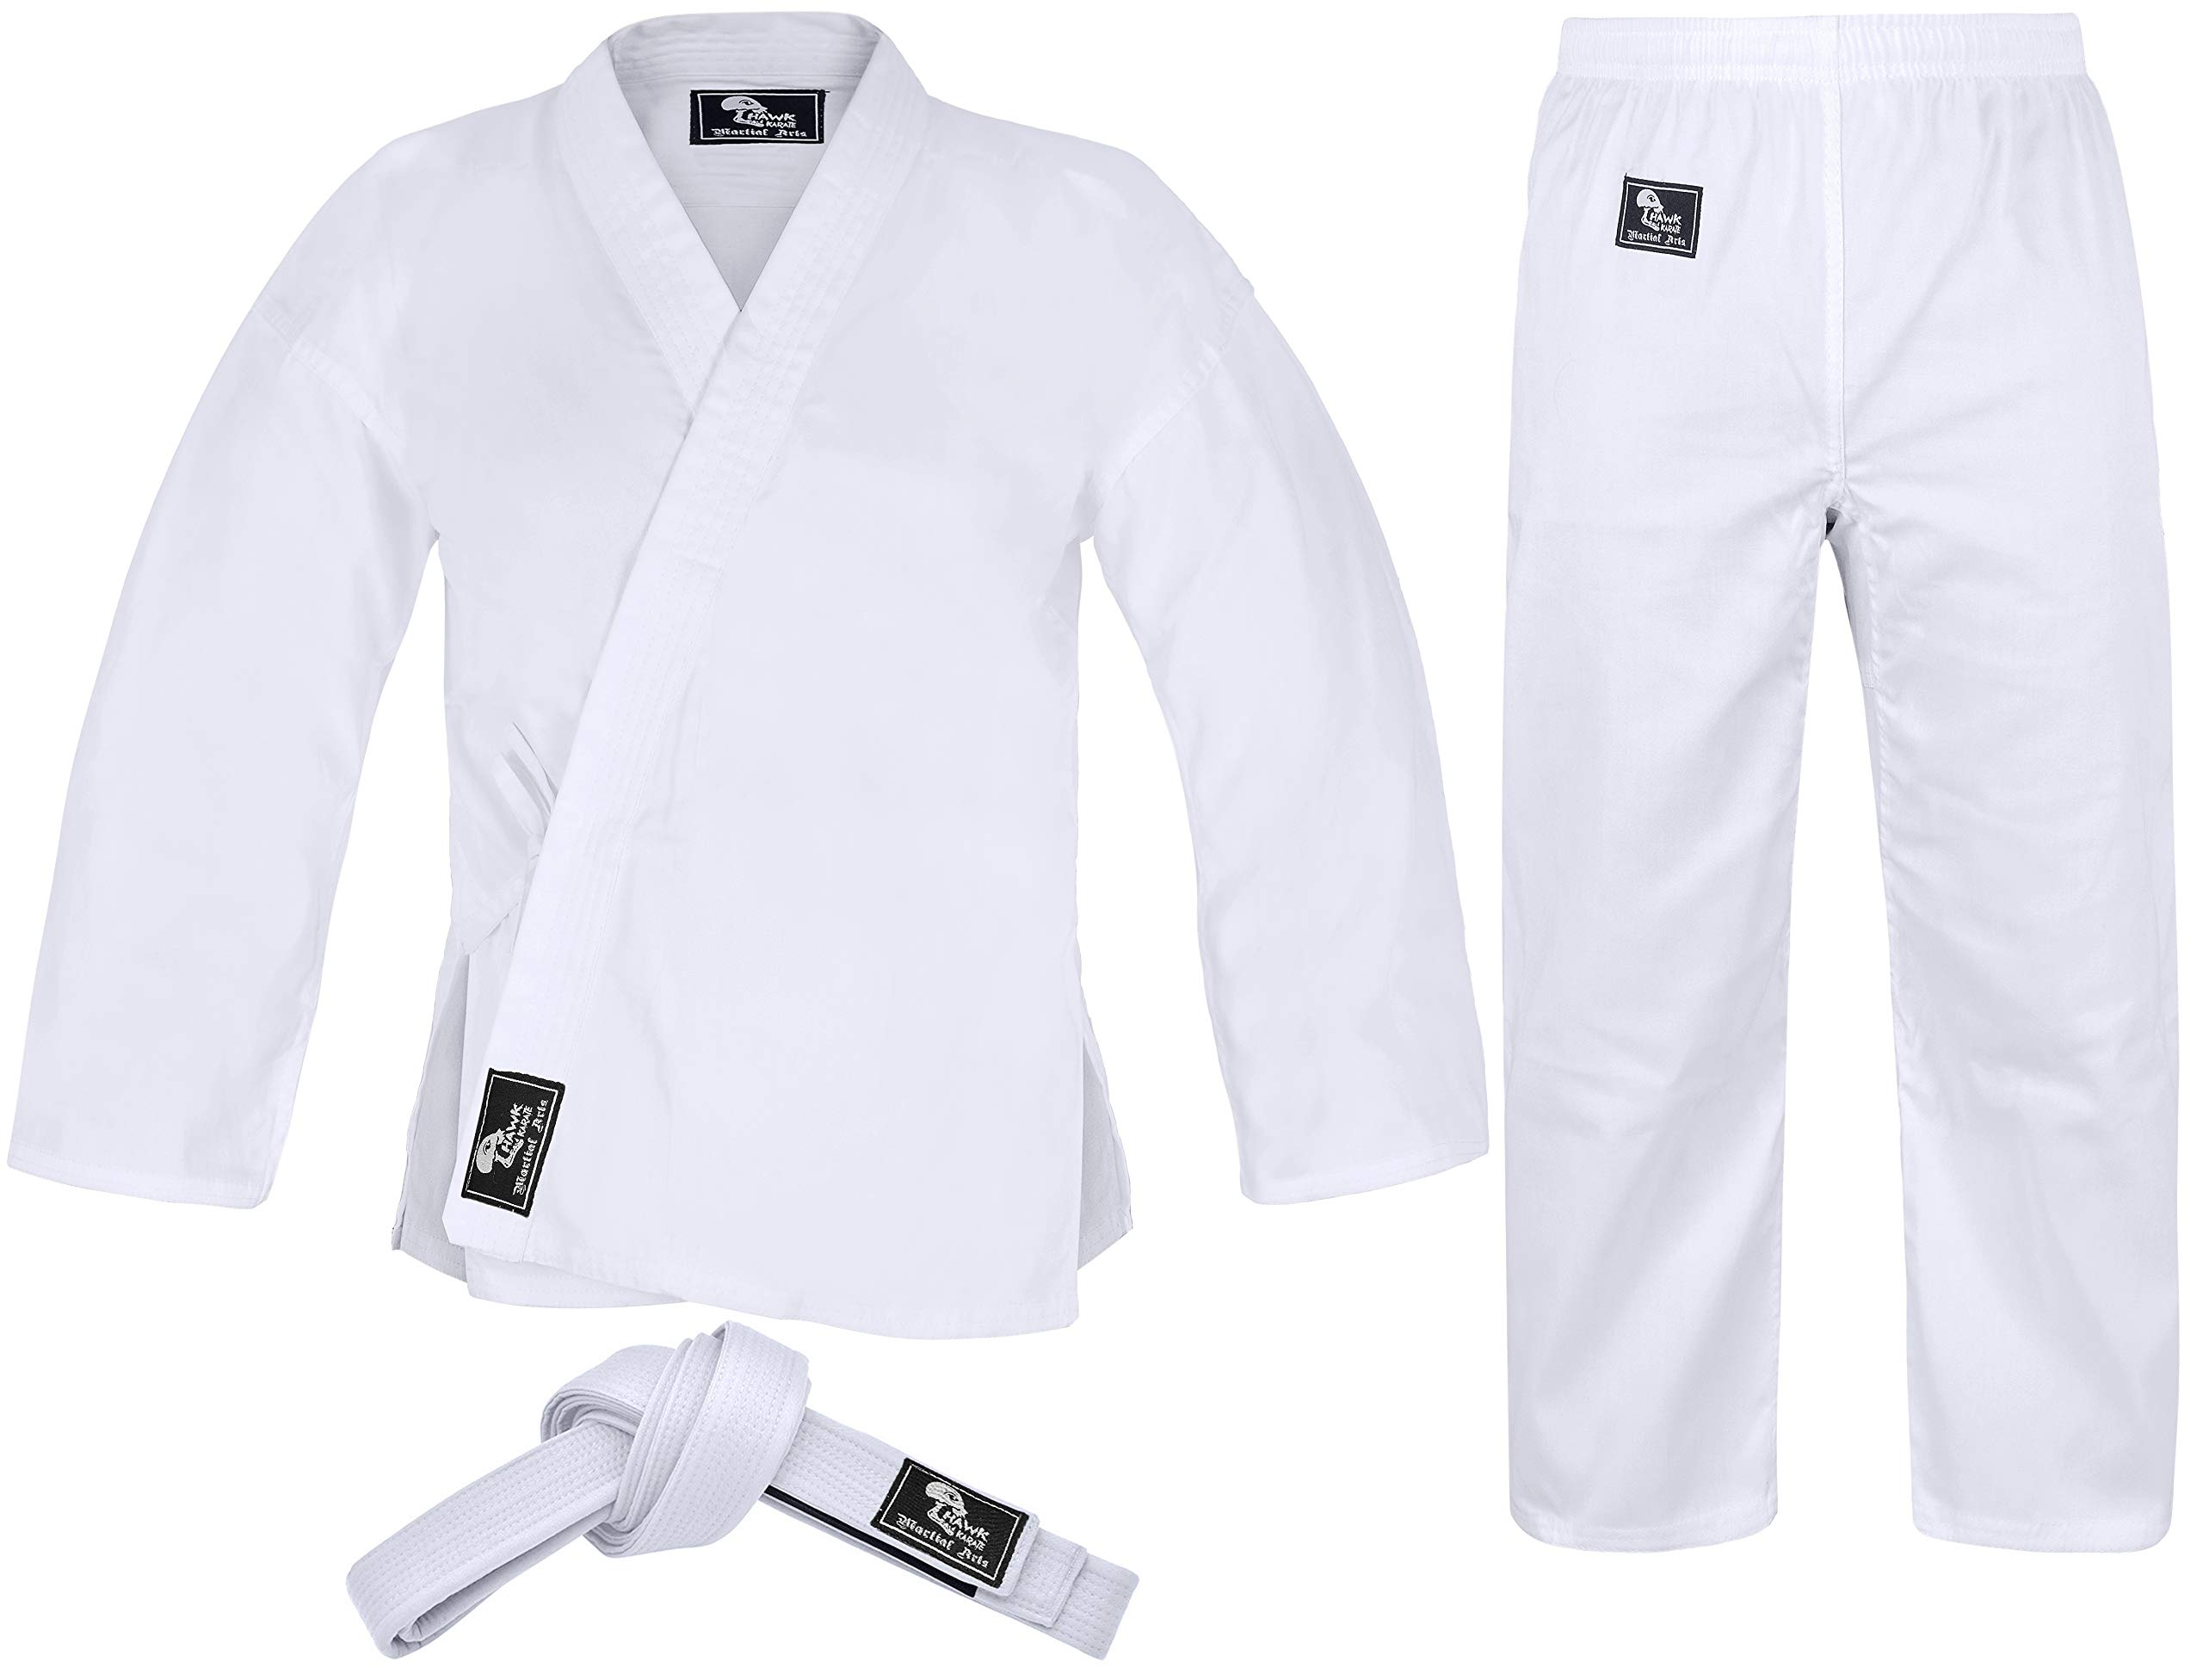 Hawk Sports Karate Uniform for Kids & Adults Lightweight Student Karate Gi Martial Arts Uniform Free Belt (White, 6 (6'2'' / 200lbs)) by Hawk Sports